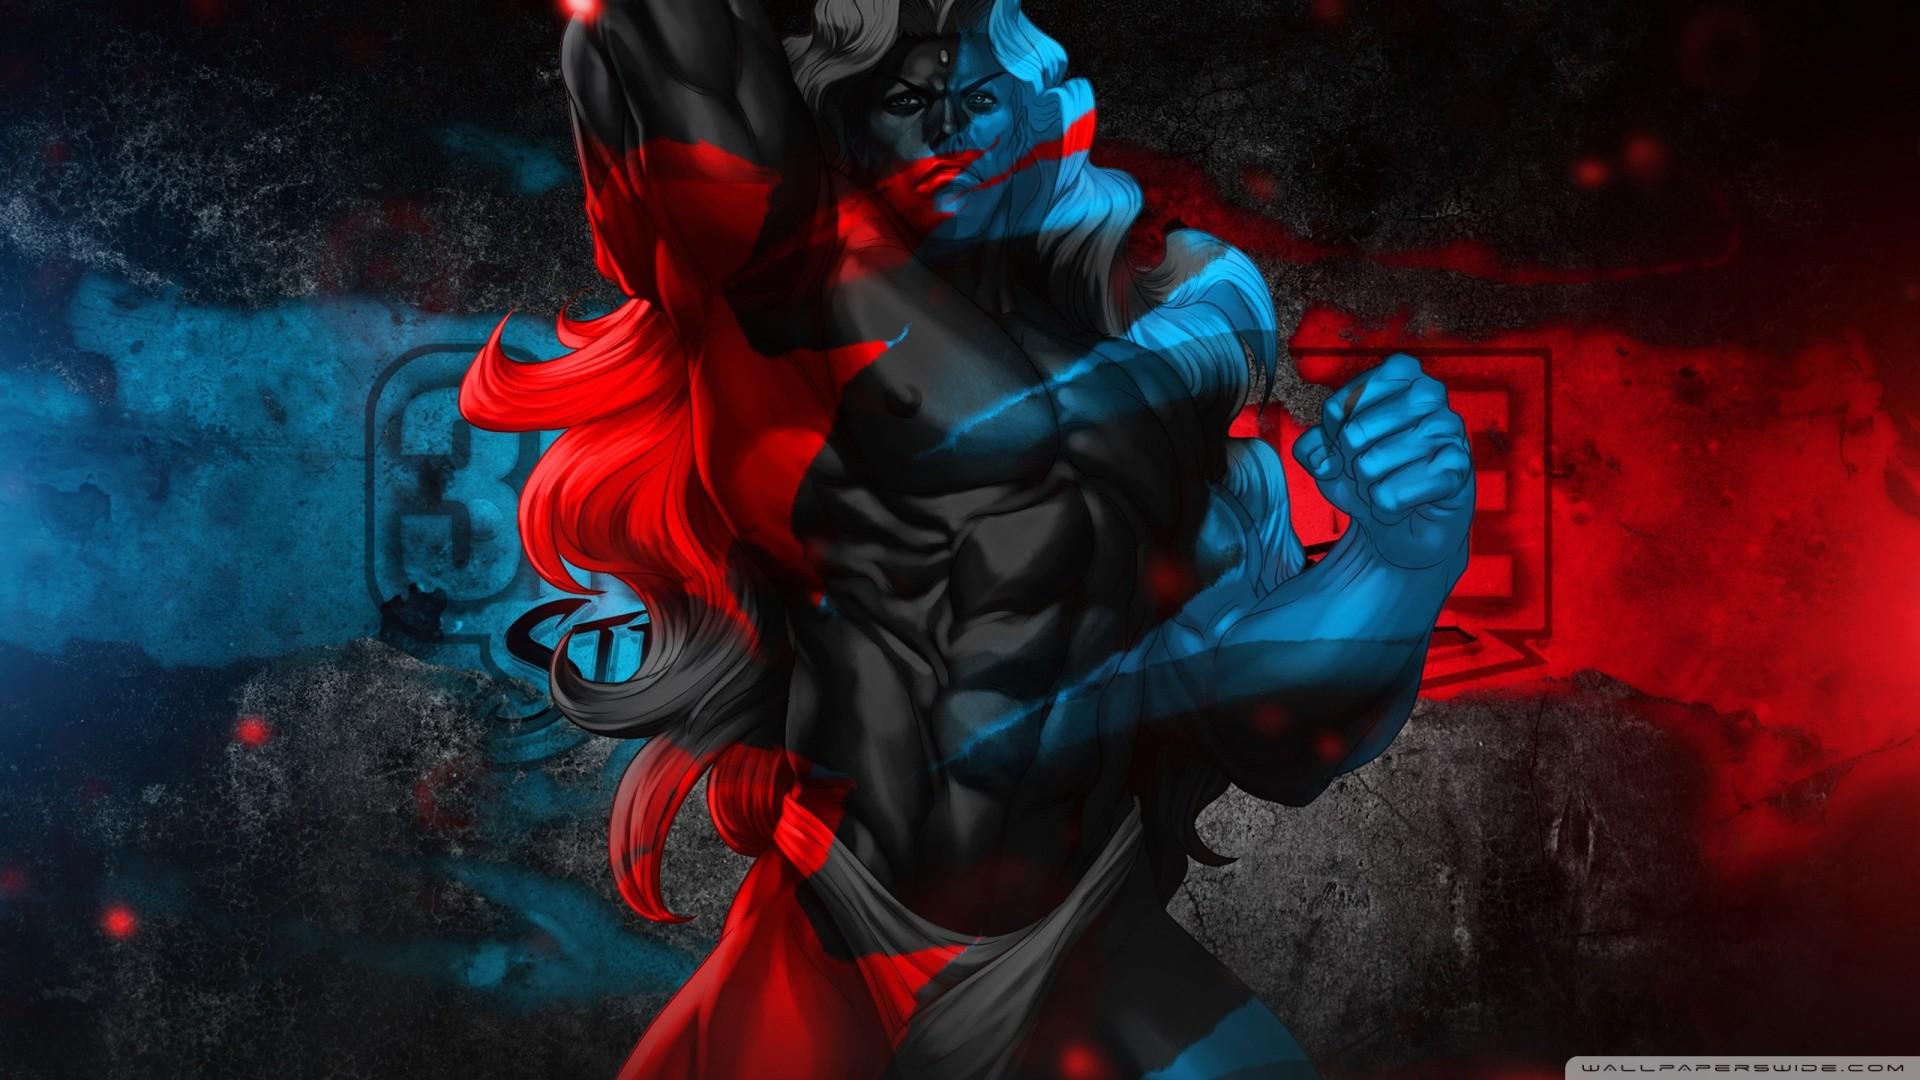 Res: 1920x1080, Evil Ryu Street Fighter Wallpaper galleryhipcom The